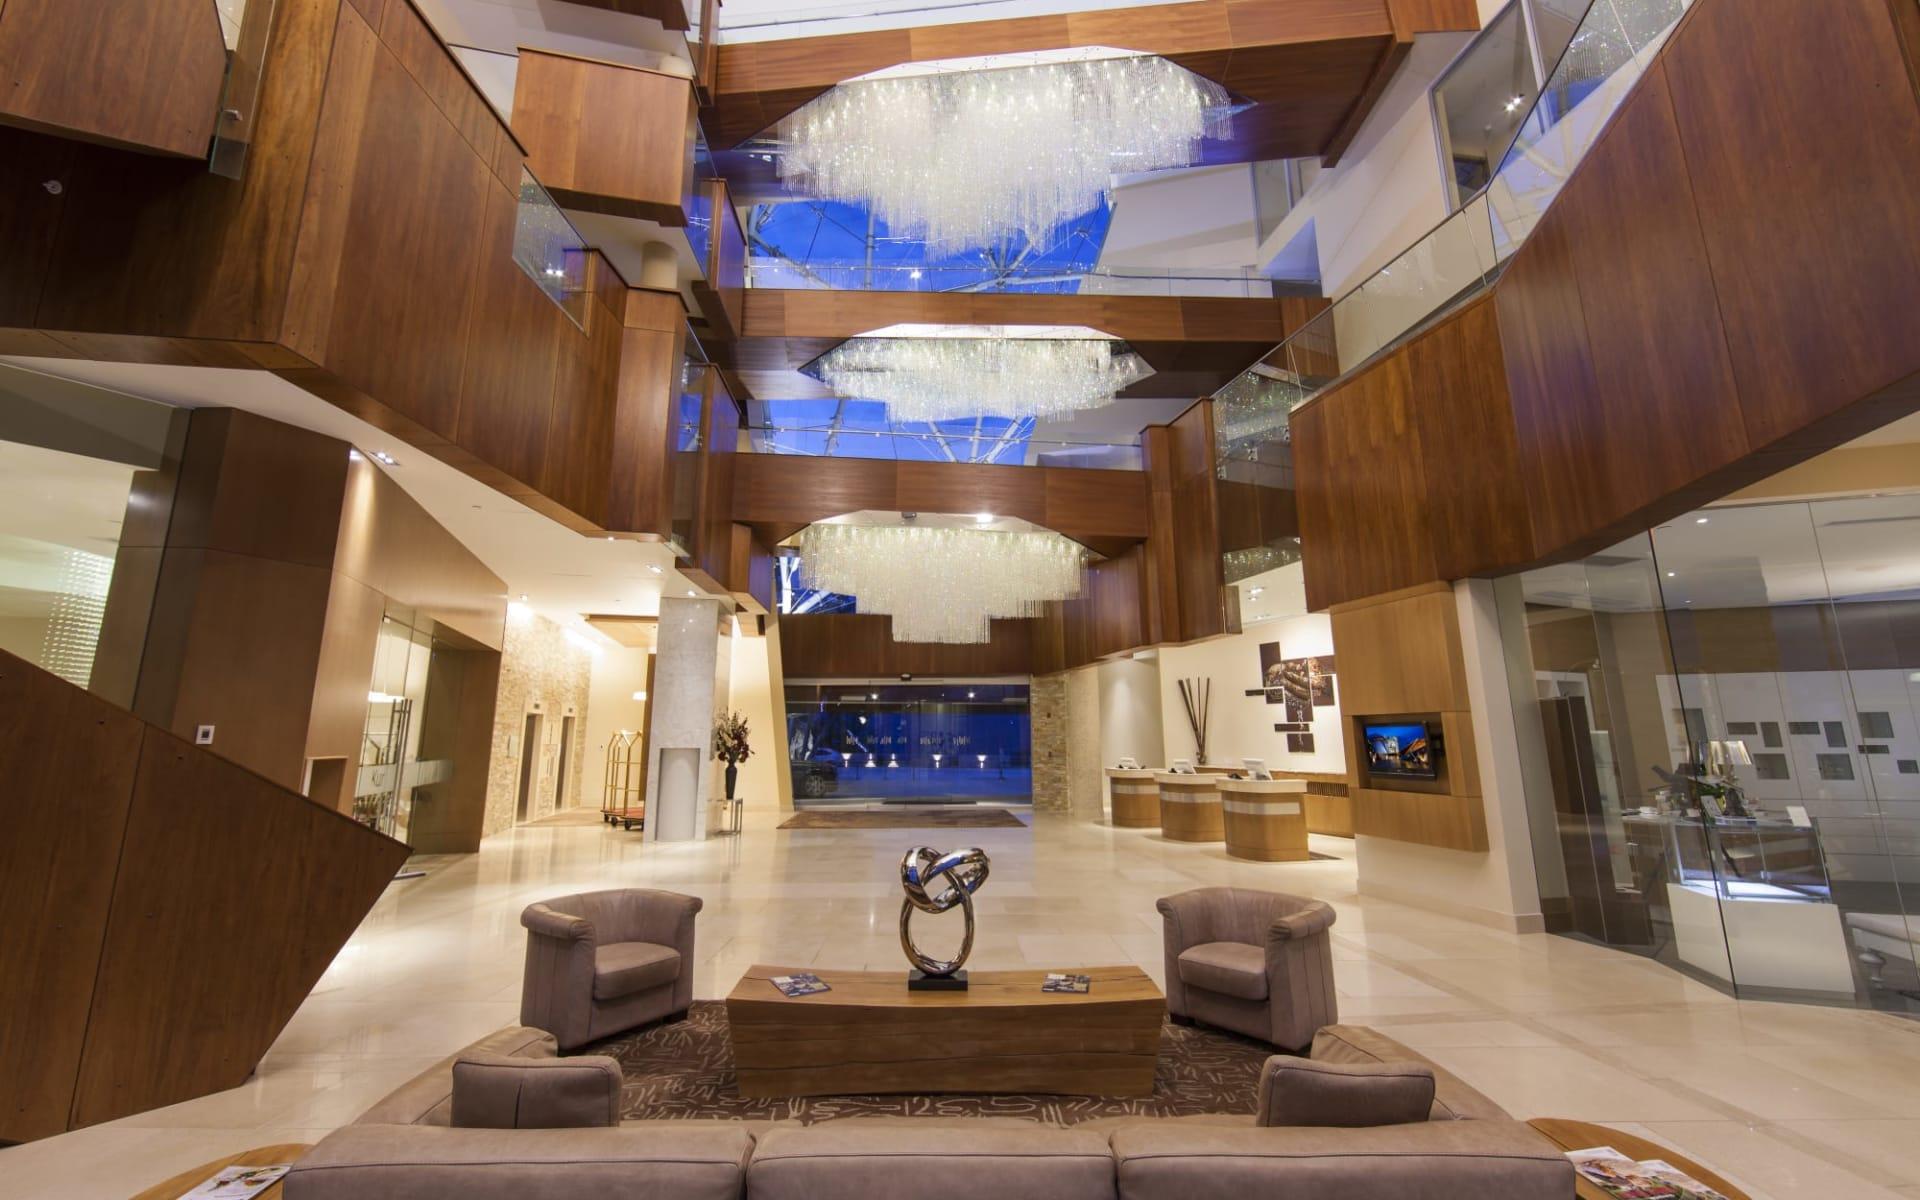 Sparkling Hill Wellness- & Spa Resort in Vernon:  facilities_Sparkling Hill Wellness & Spa Resort_Lobby